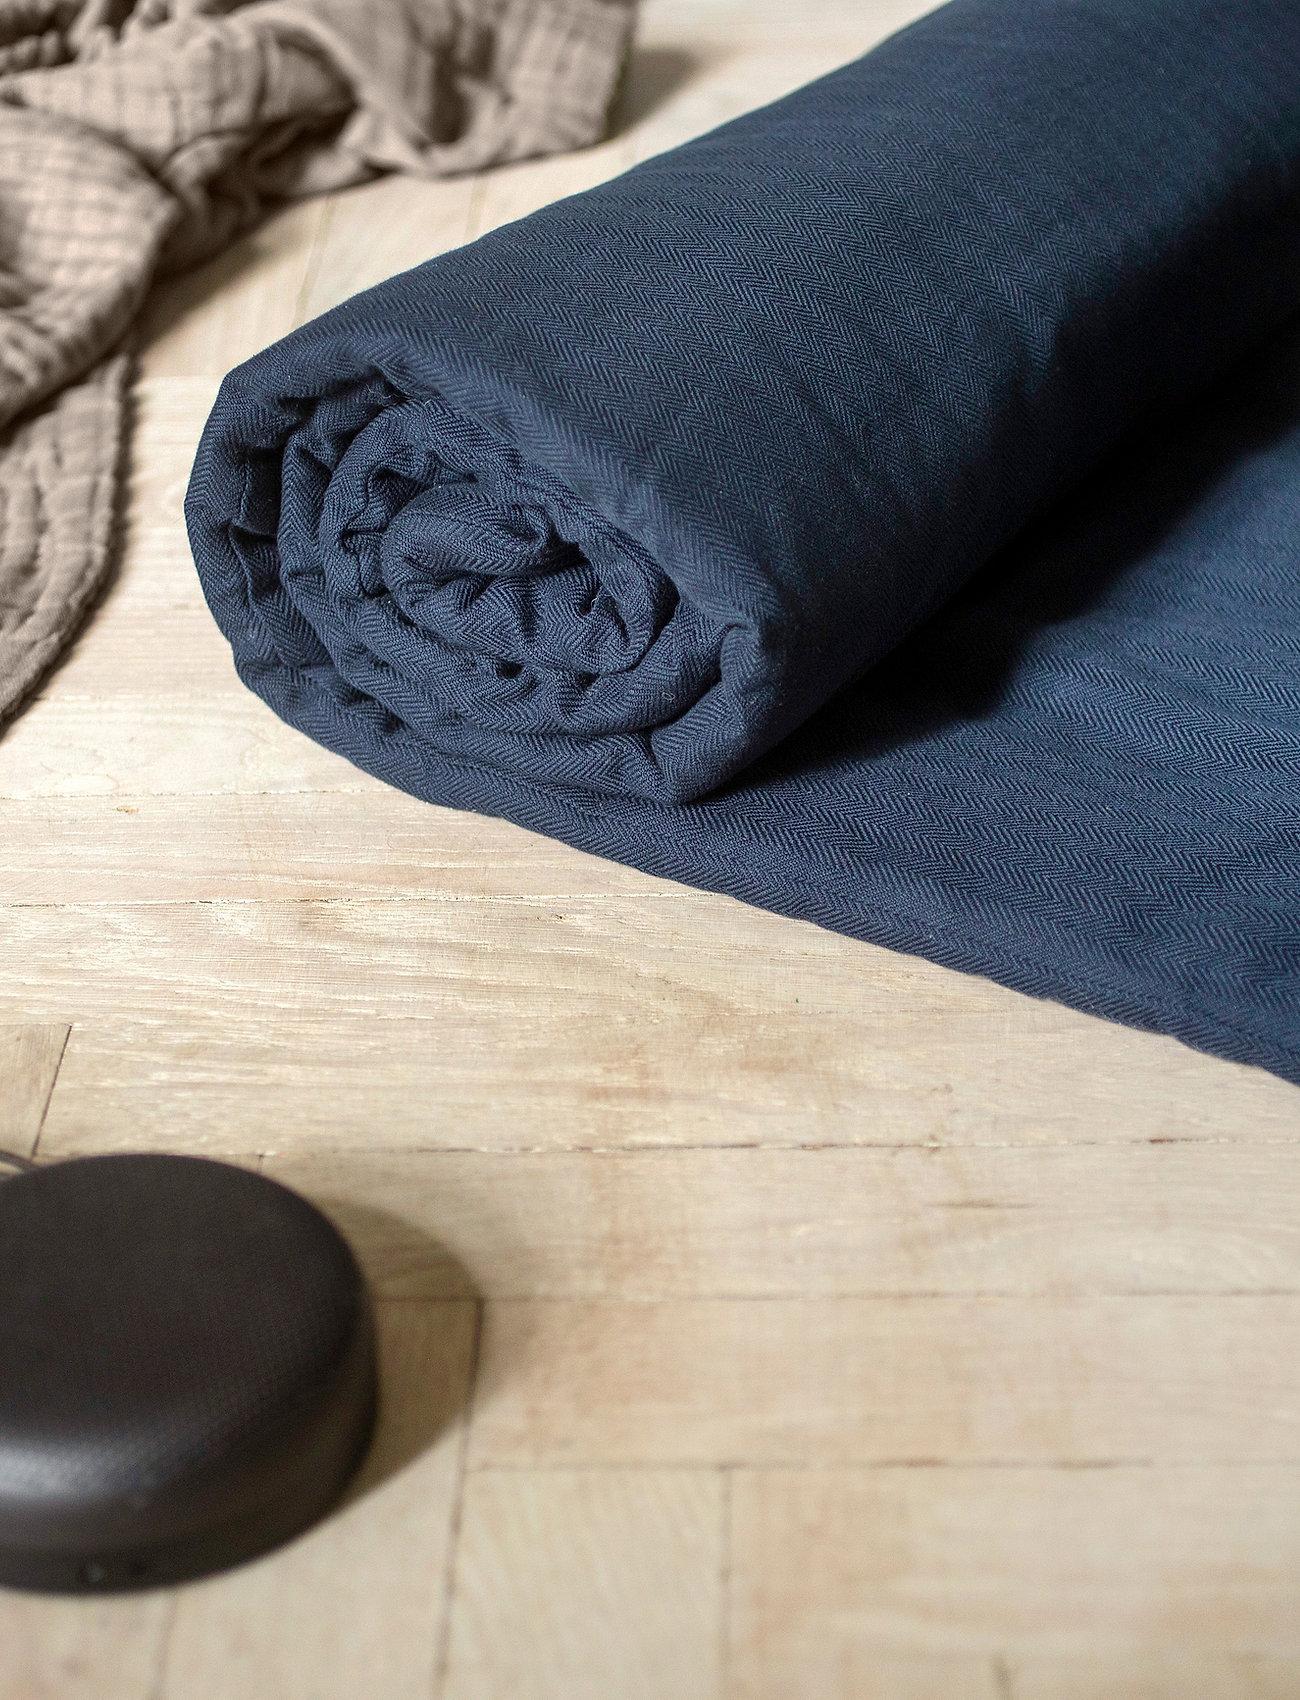 The Organic Company - Meditation Mattress - yogamåtter & tilbehør - 110 dark grey - 3